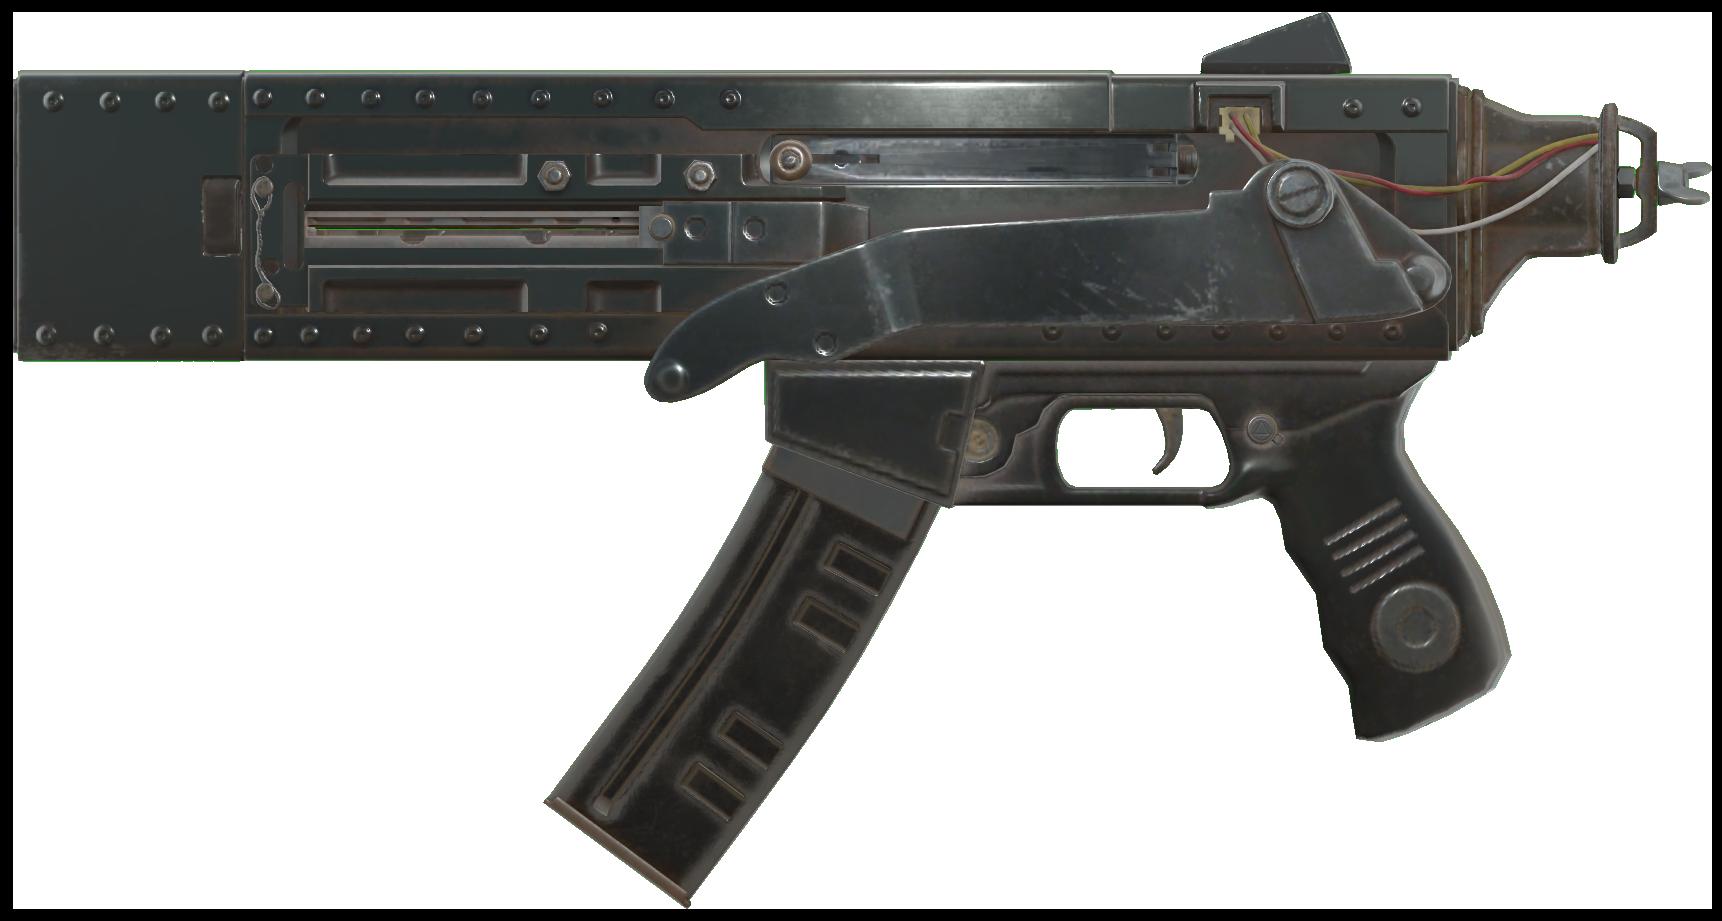 10mm submachine gun (Fallout 76) | Fallout Wiki | FANDOM